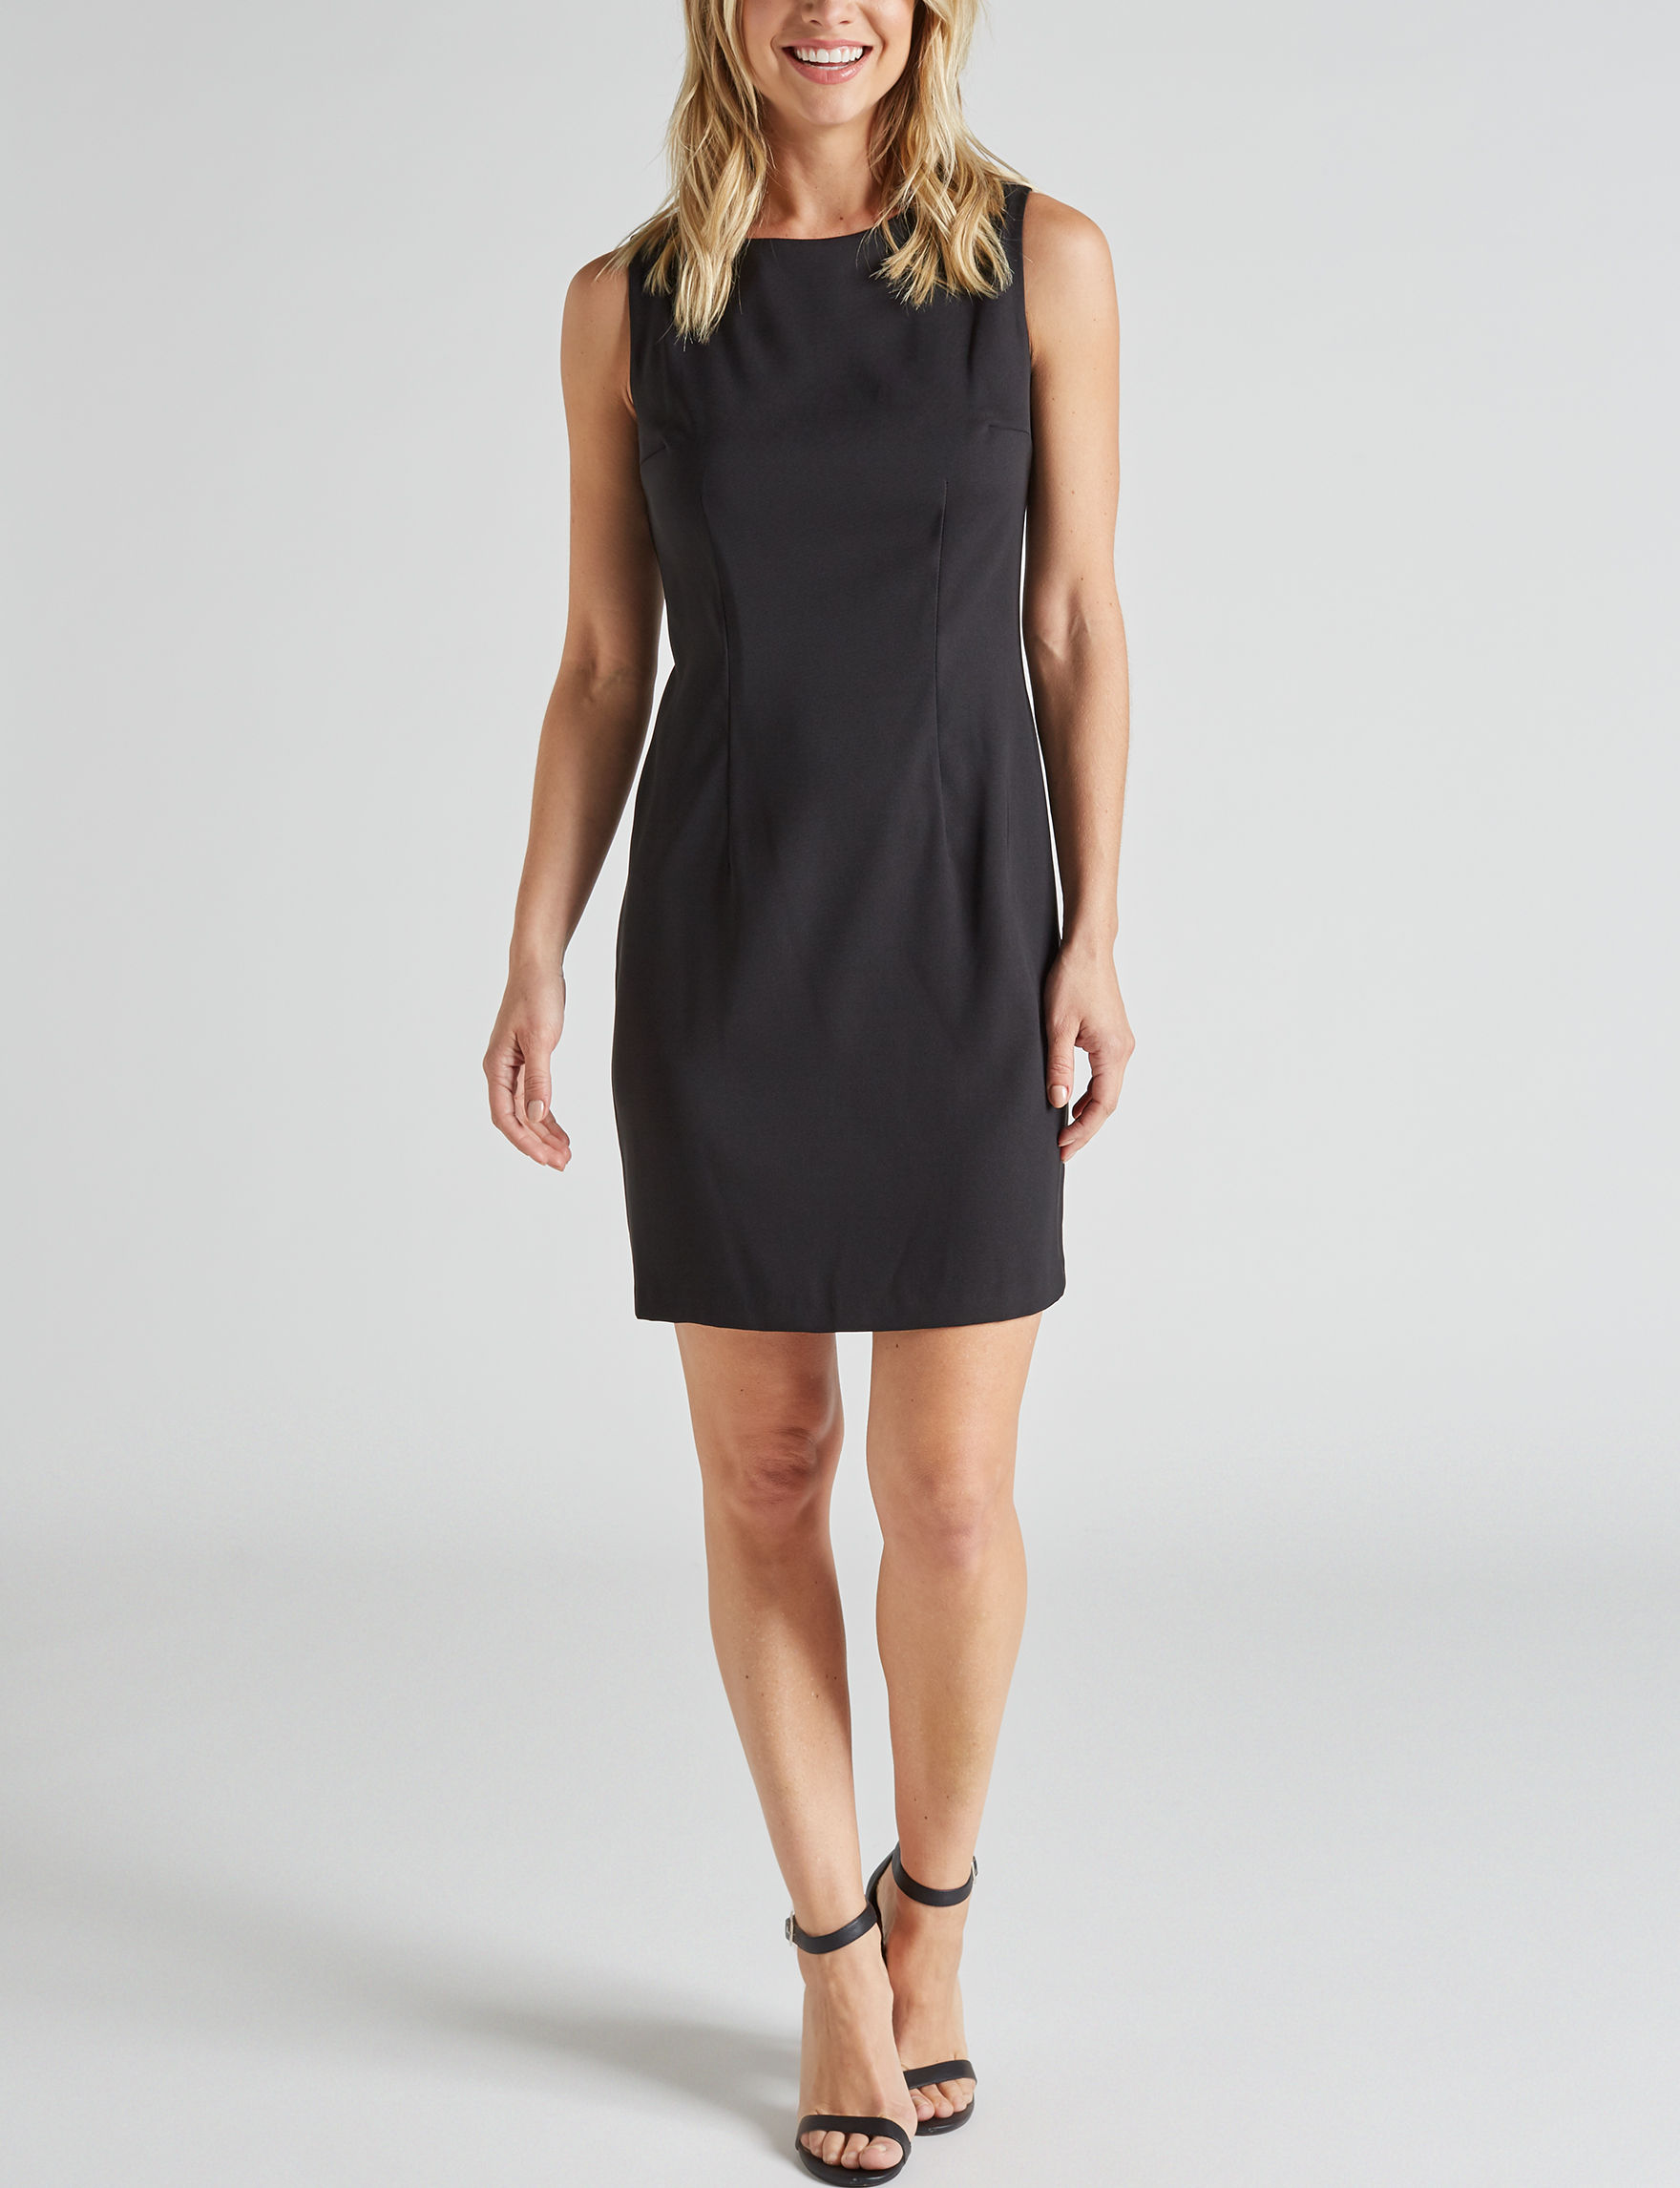 A. Byer Black Everyday & Casual Sheath Dresses